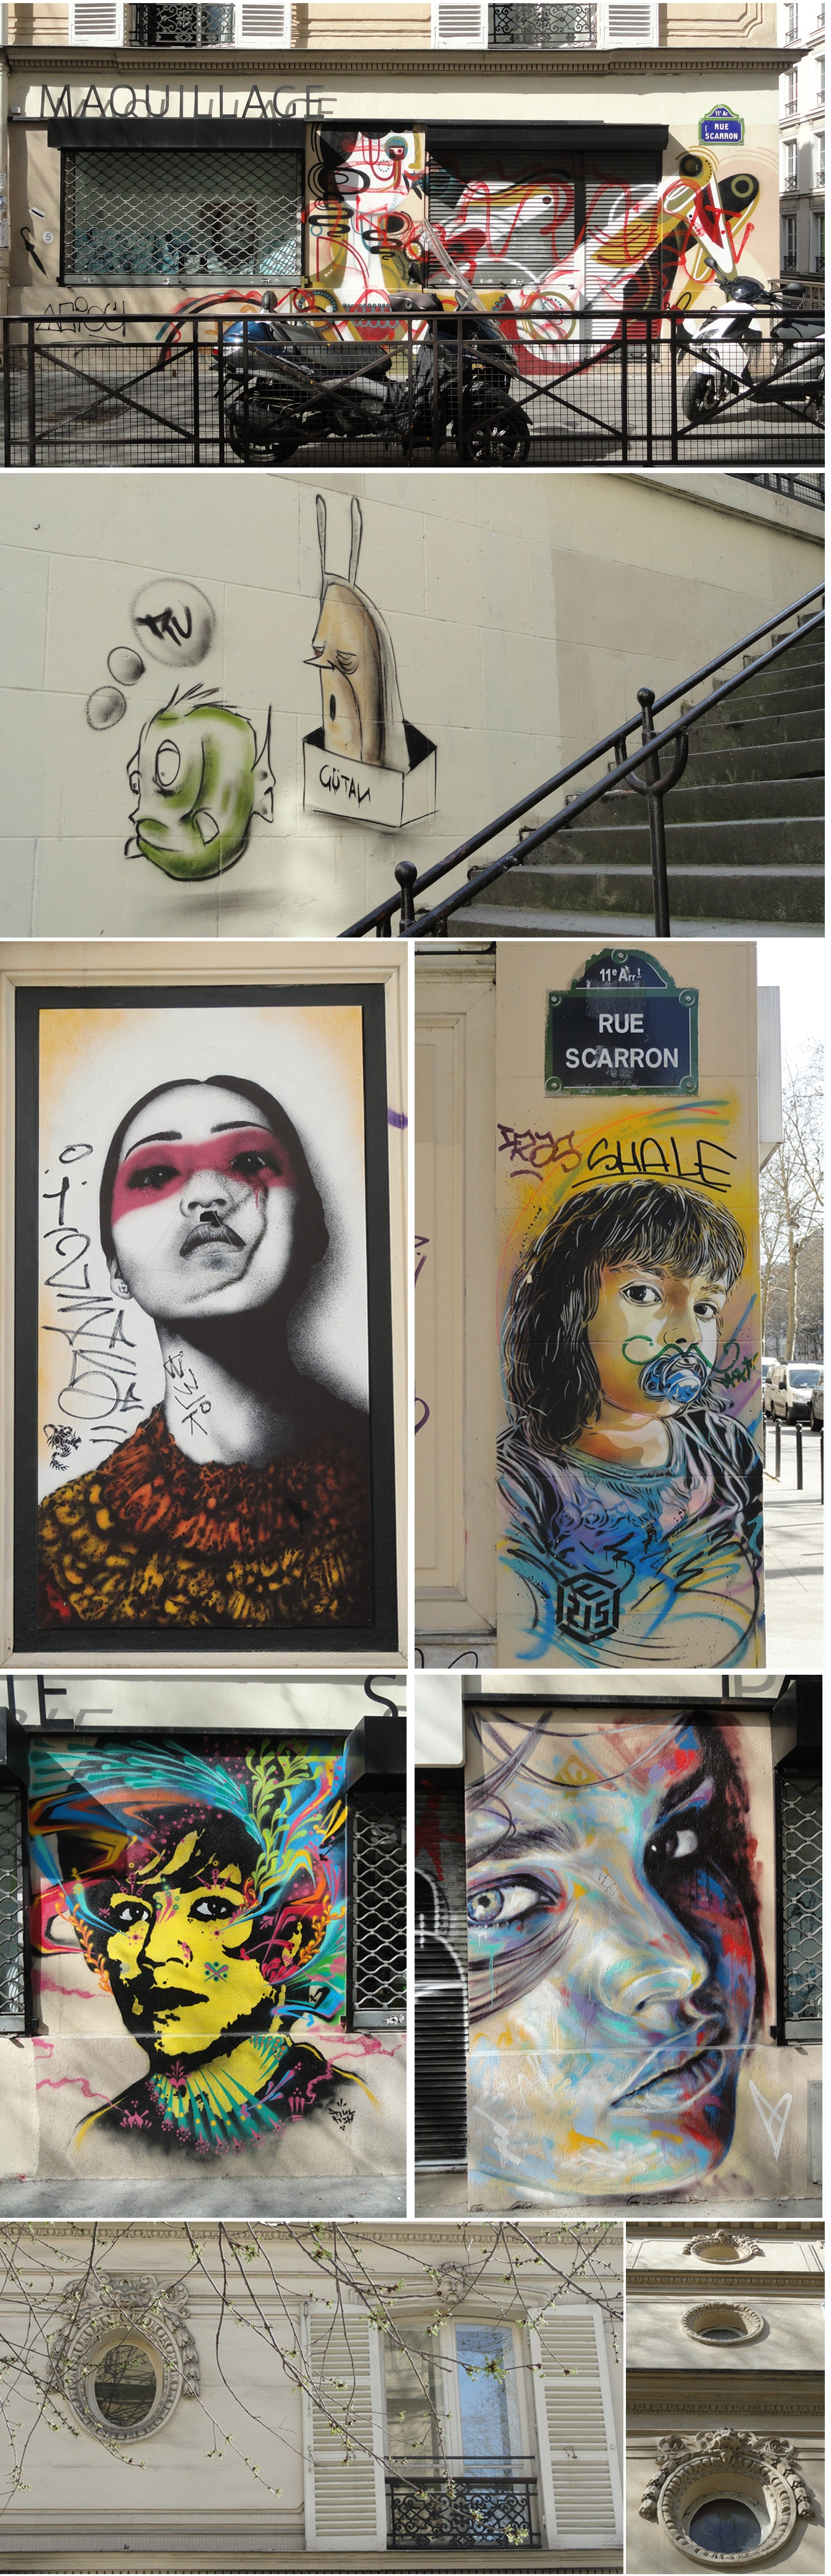 rue scarron